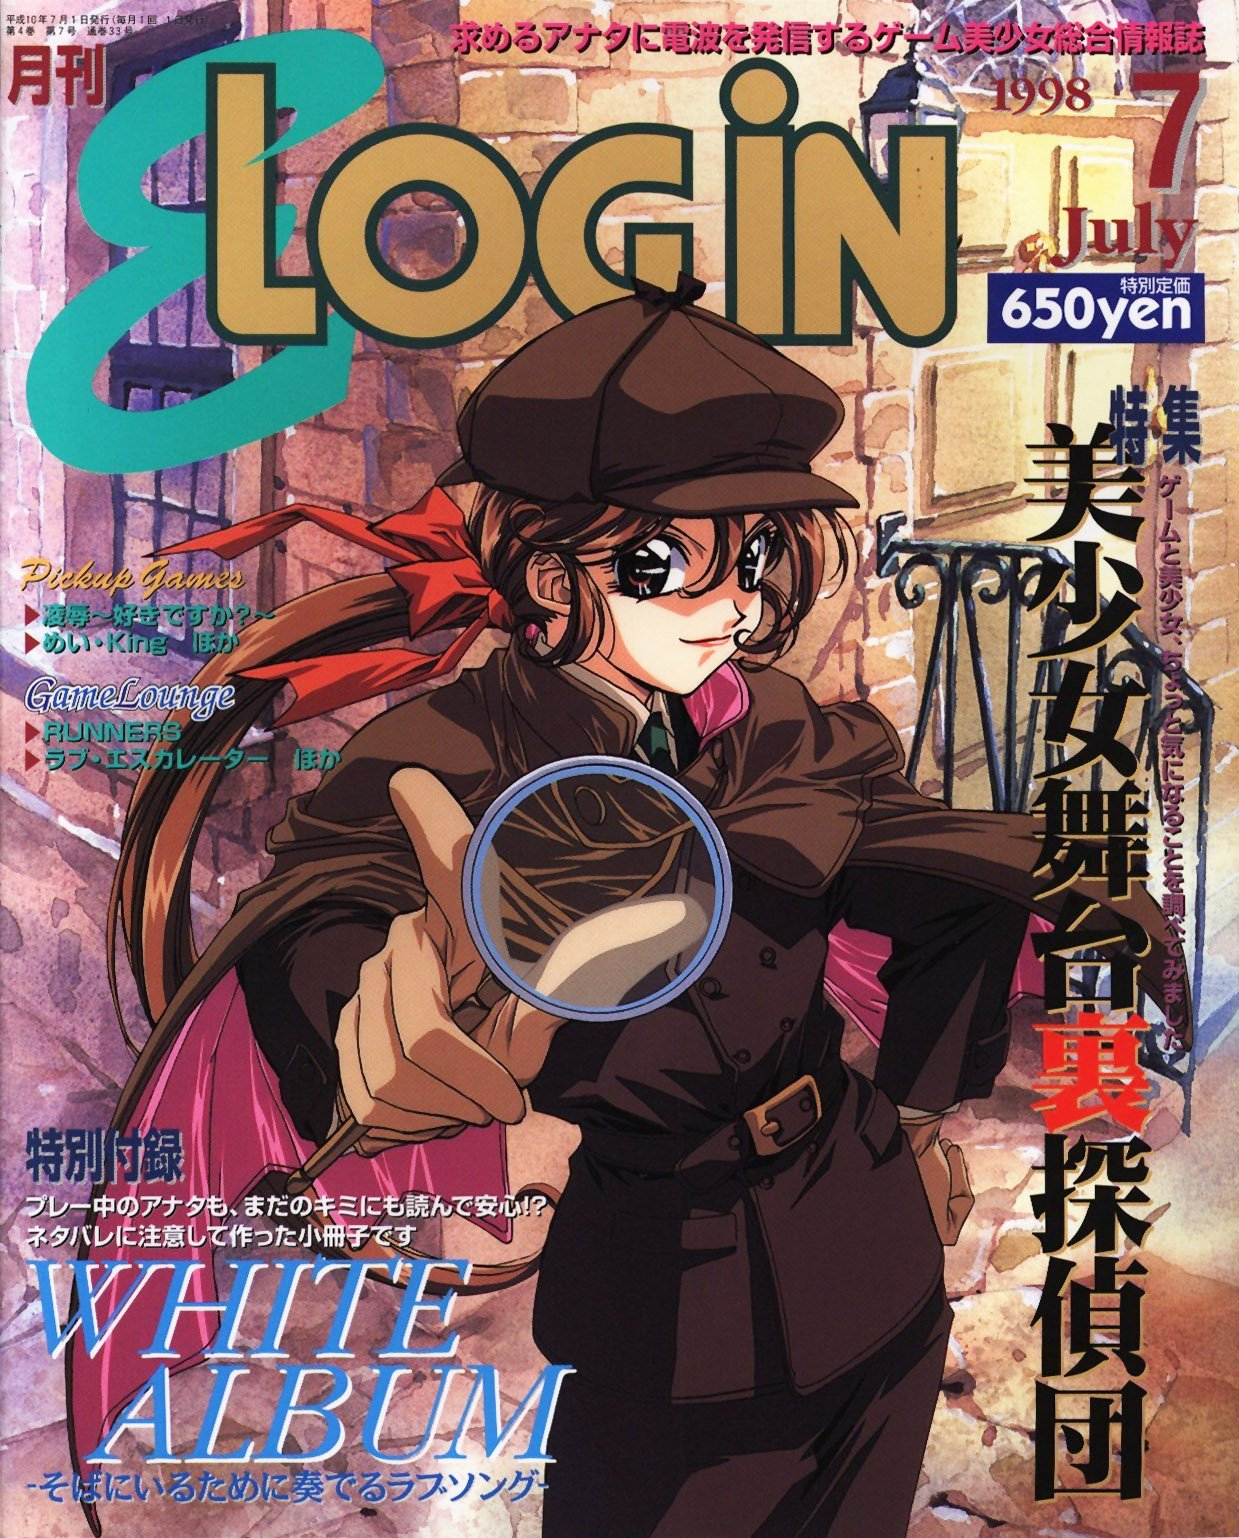 E-Login Issue 033 (July 1998)